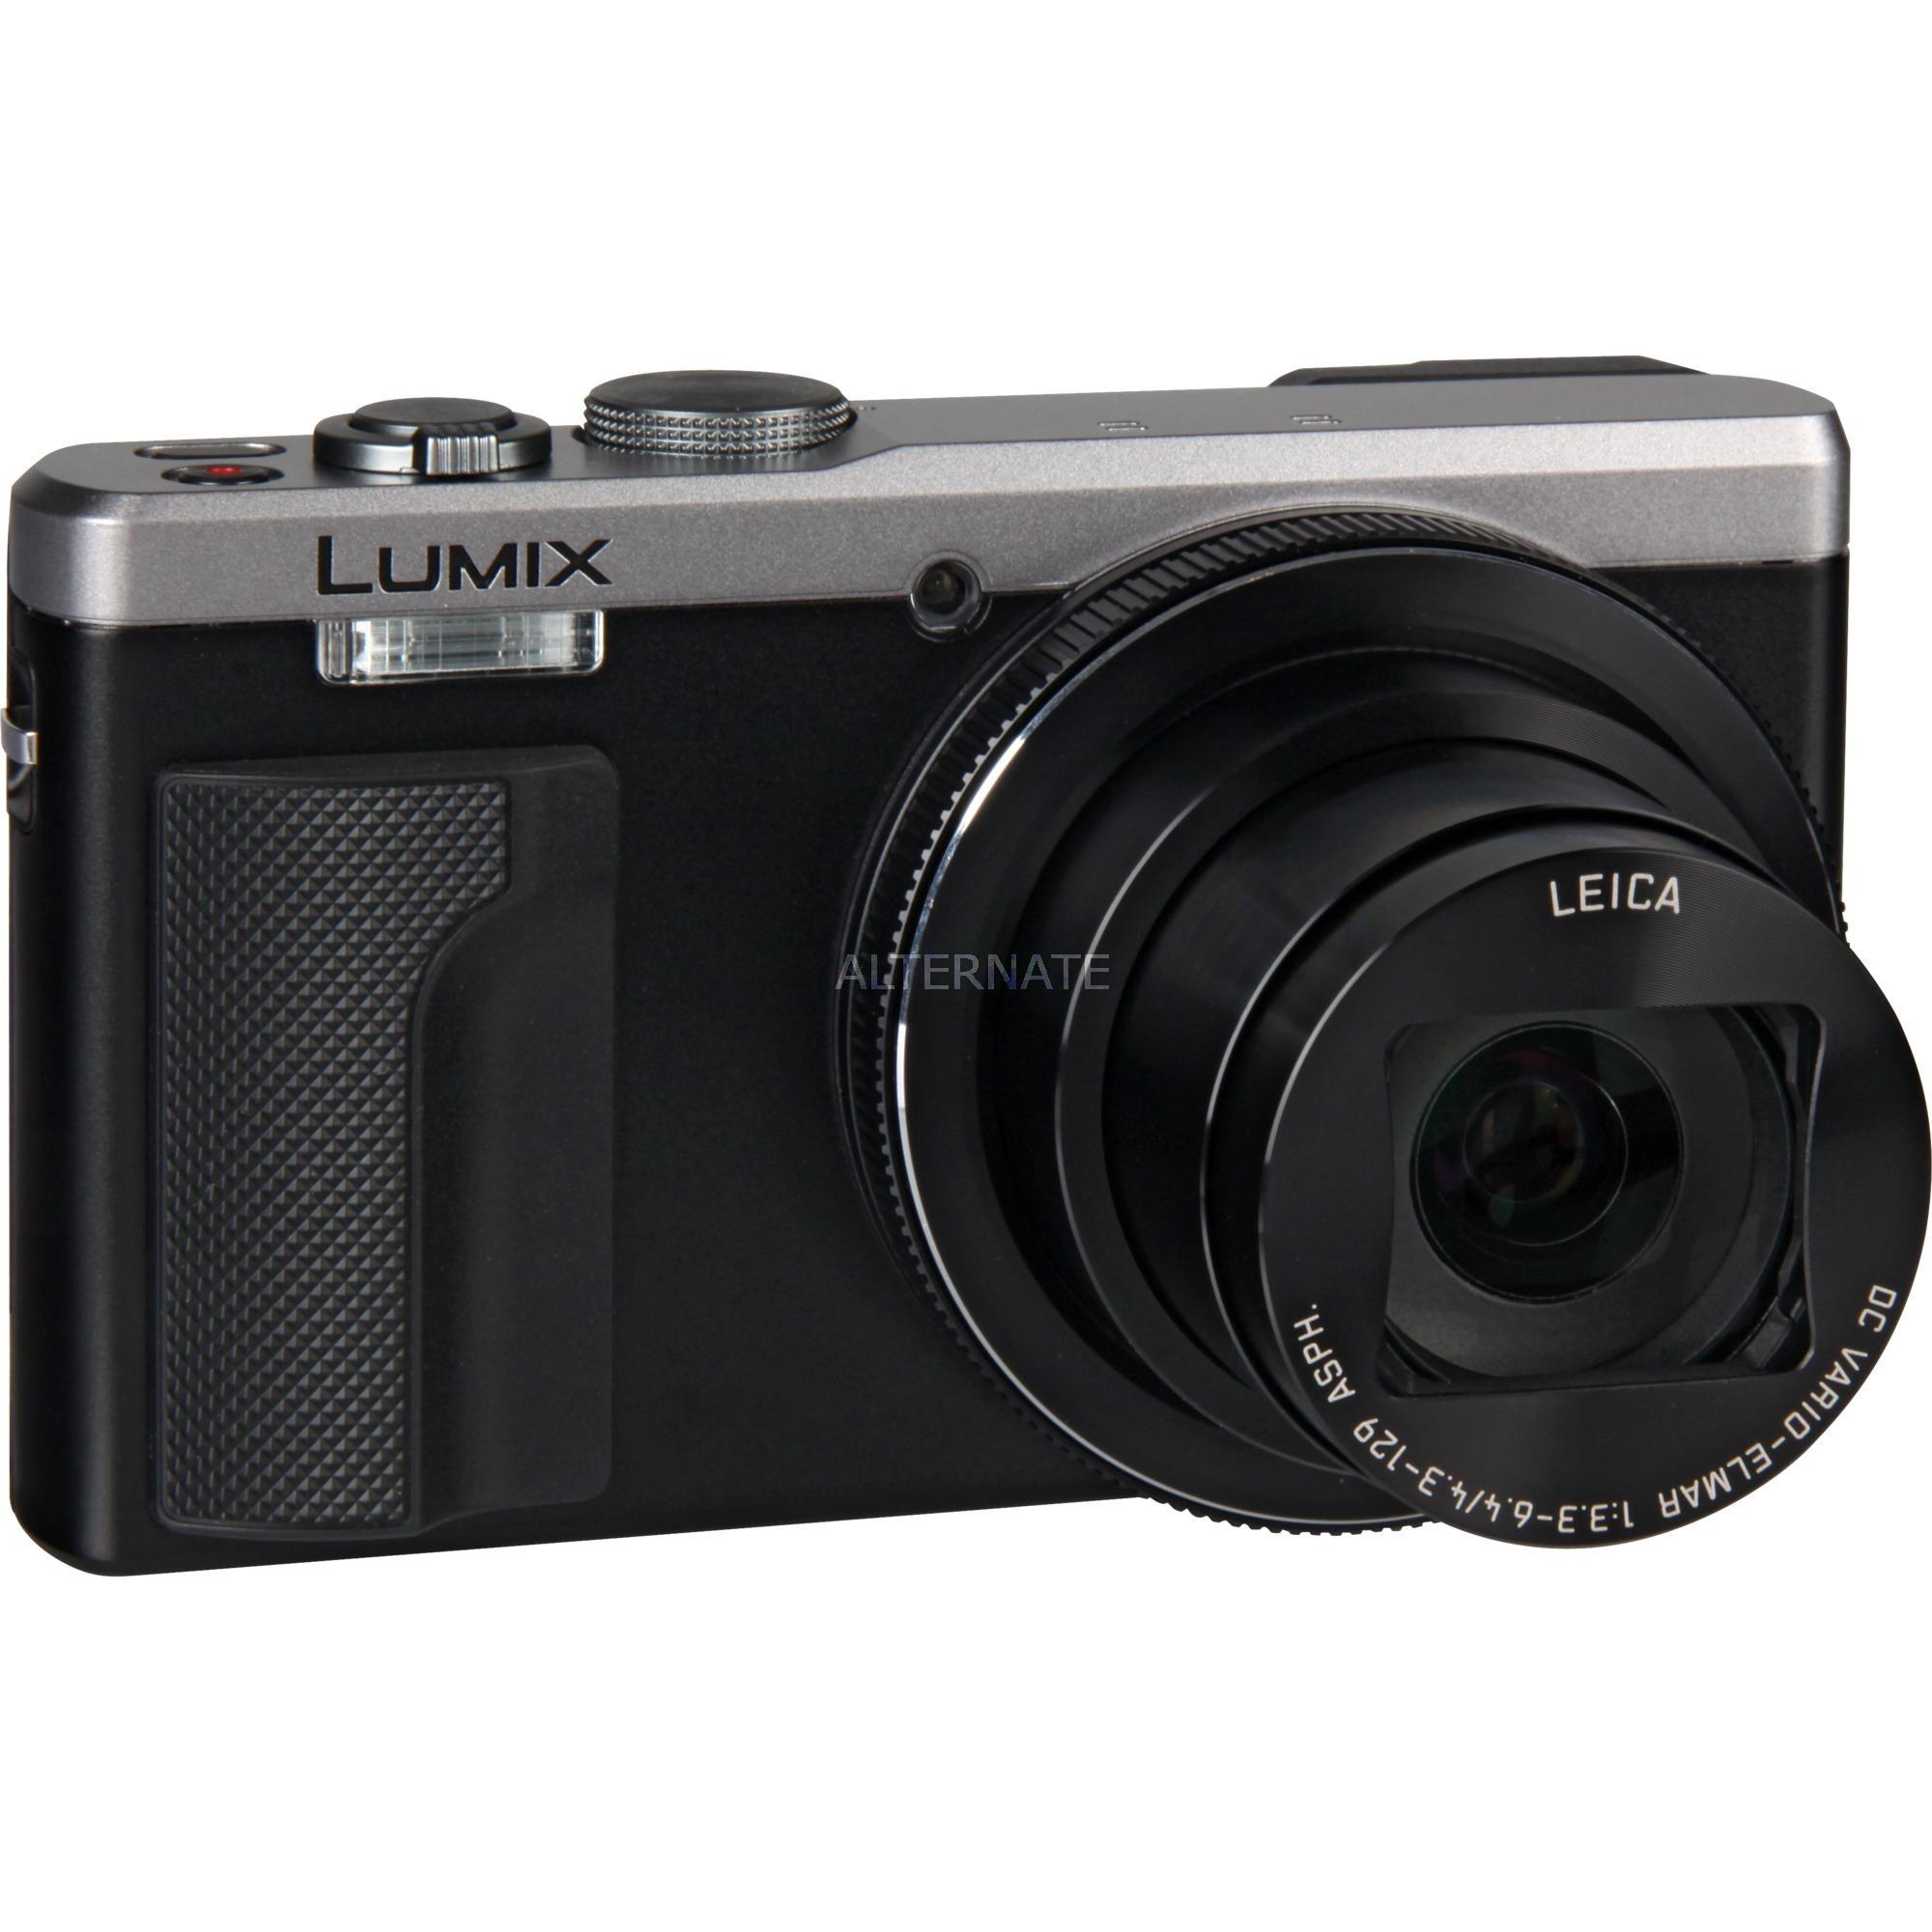 Lumix DMC-TZ81 Appareil-photo compact 18.1MP 1/2.33